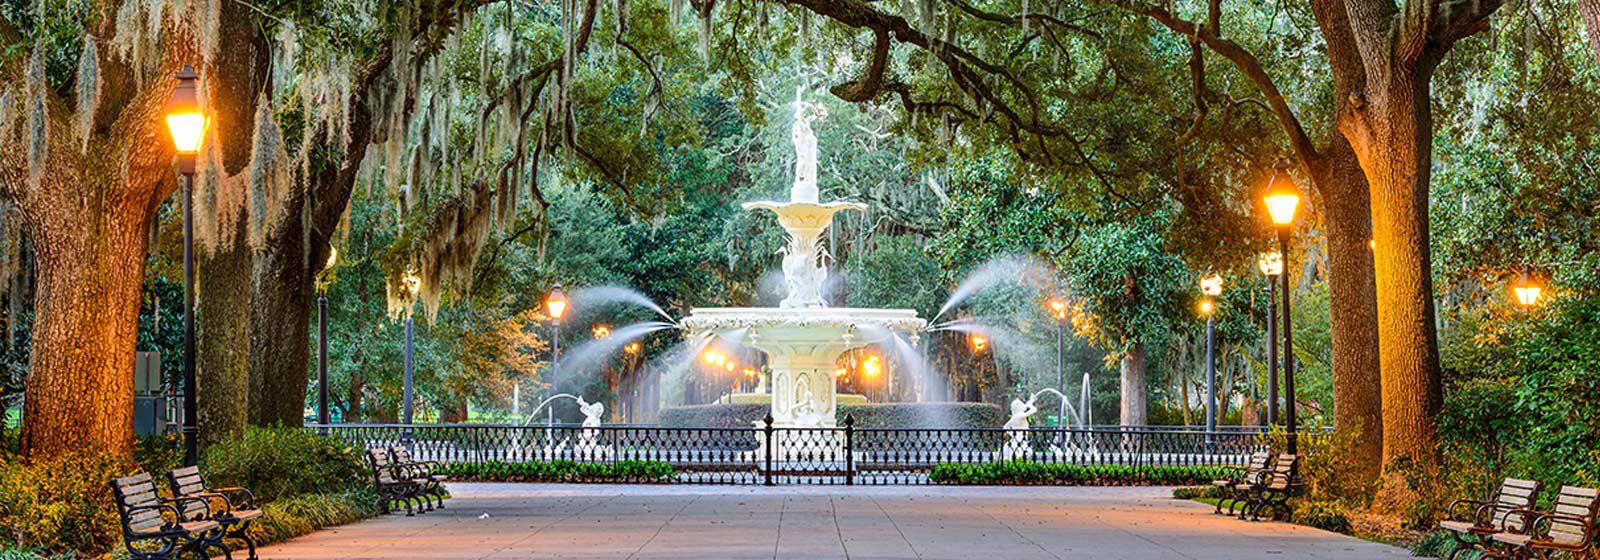 IHG's guide to historic Savannah